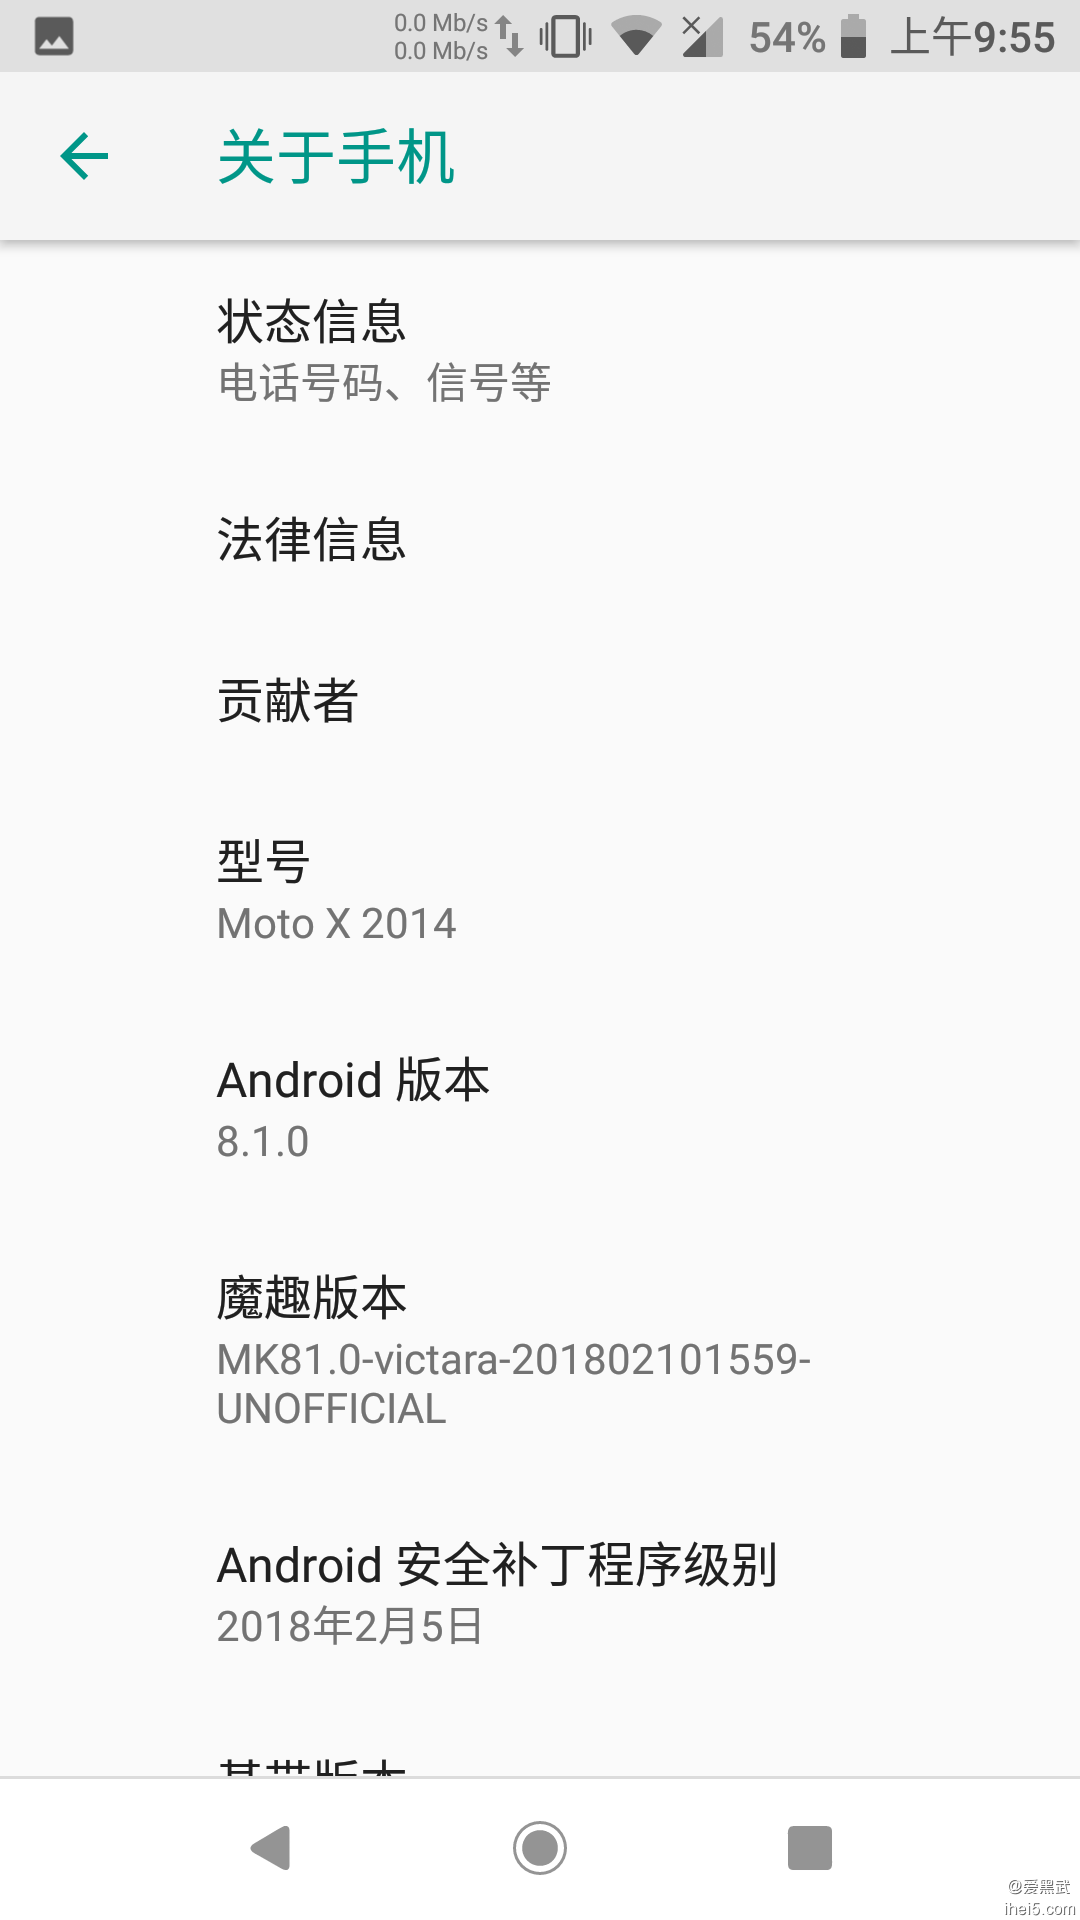 Screenshot_设置_20180218-095510.png